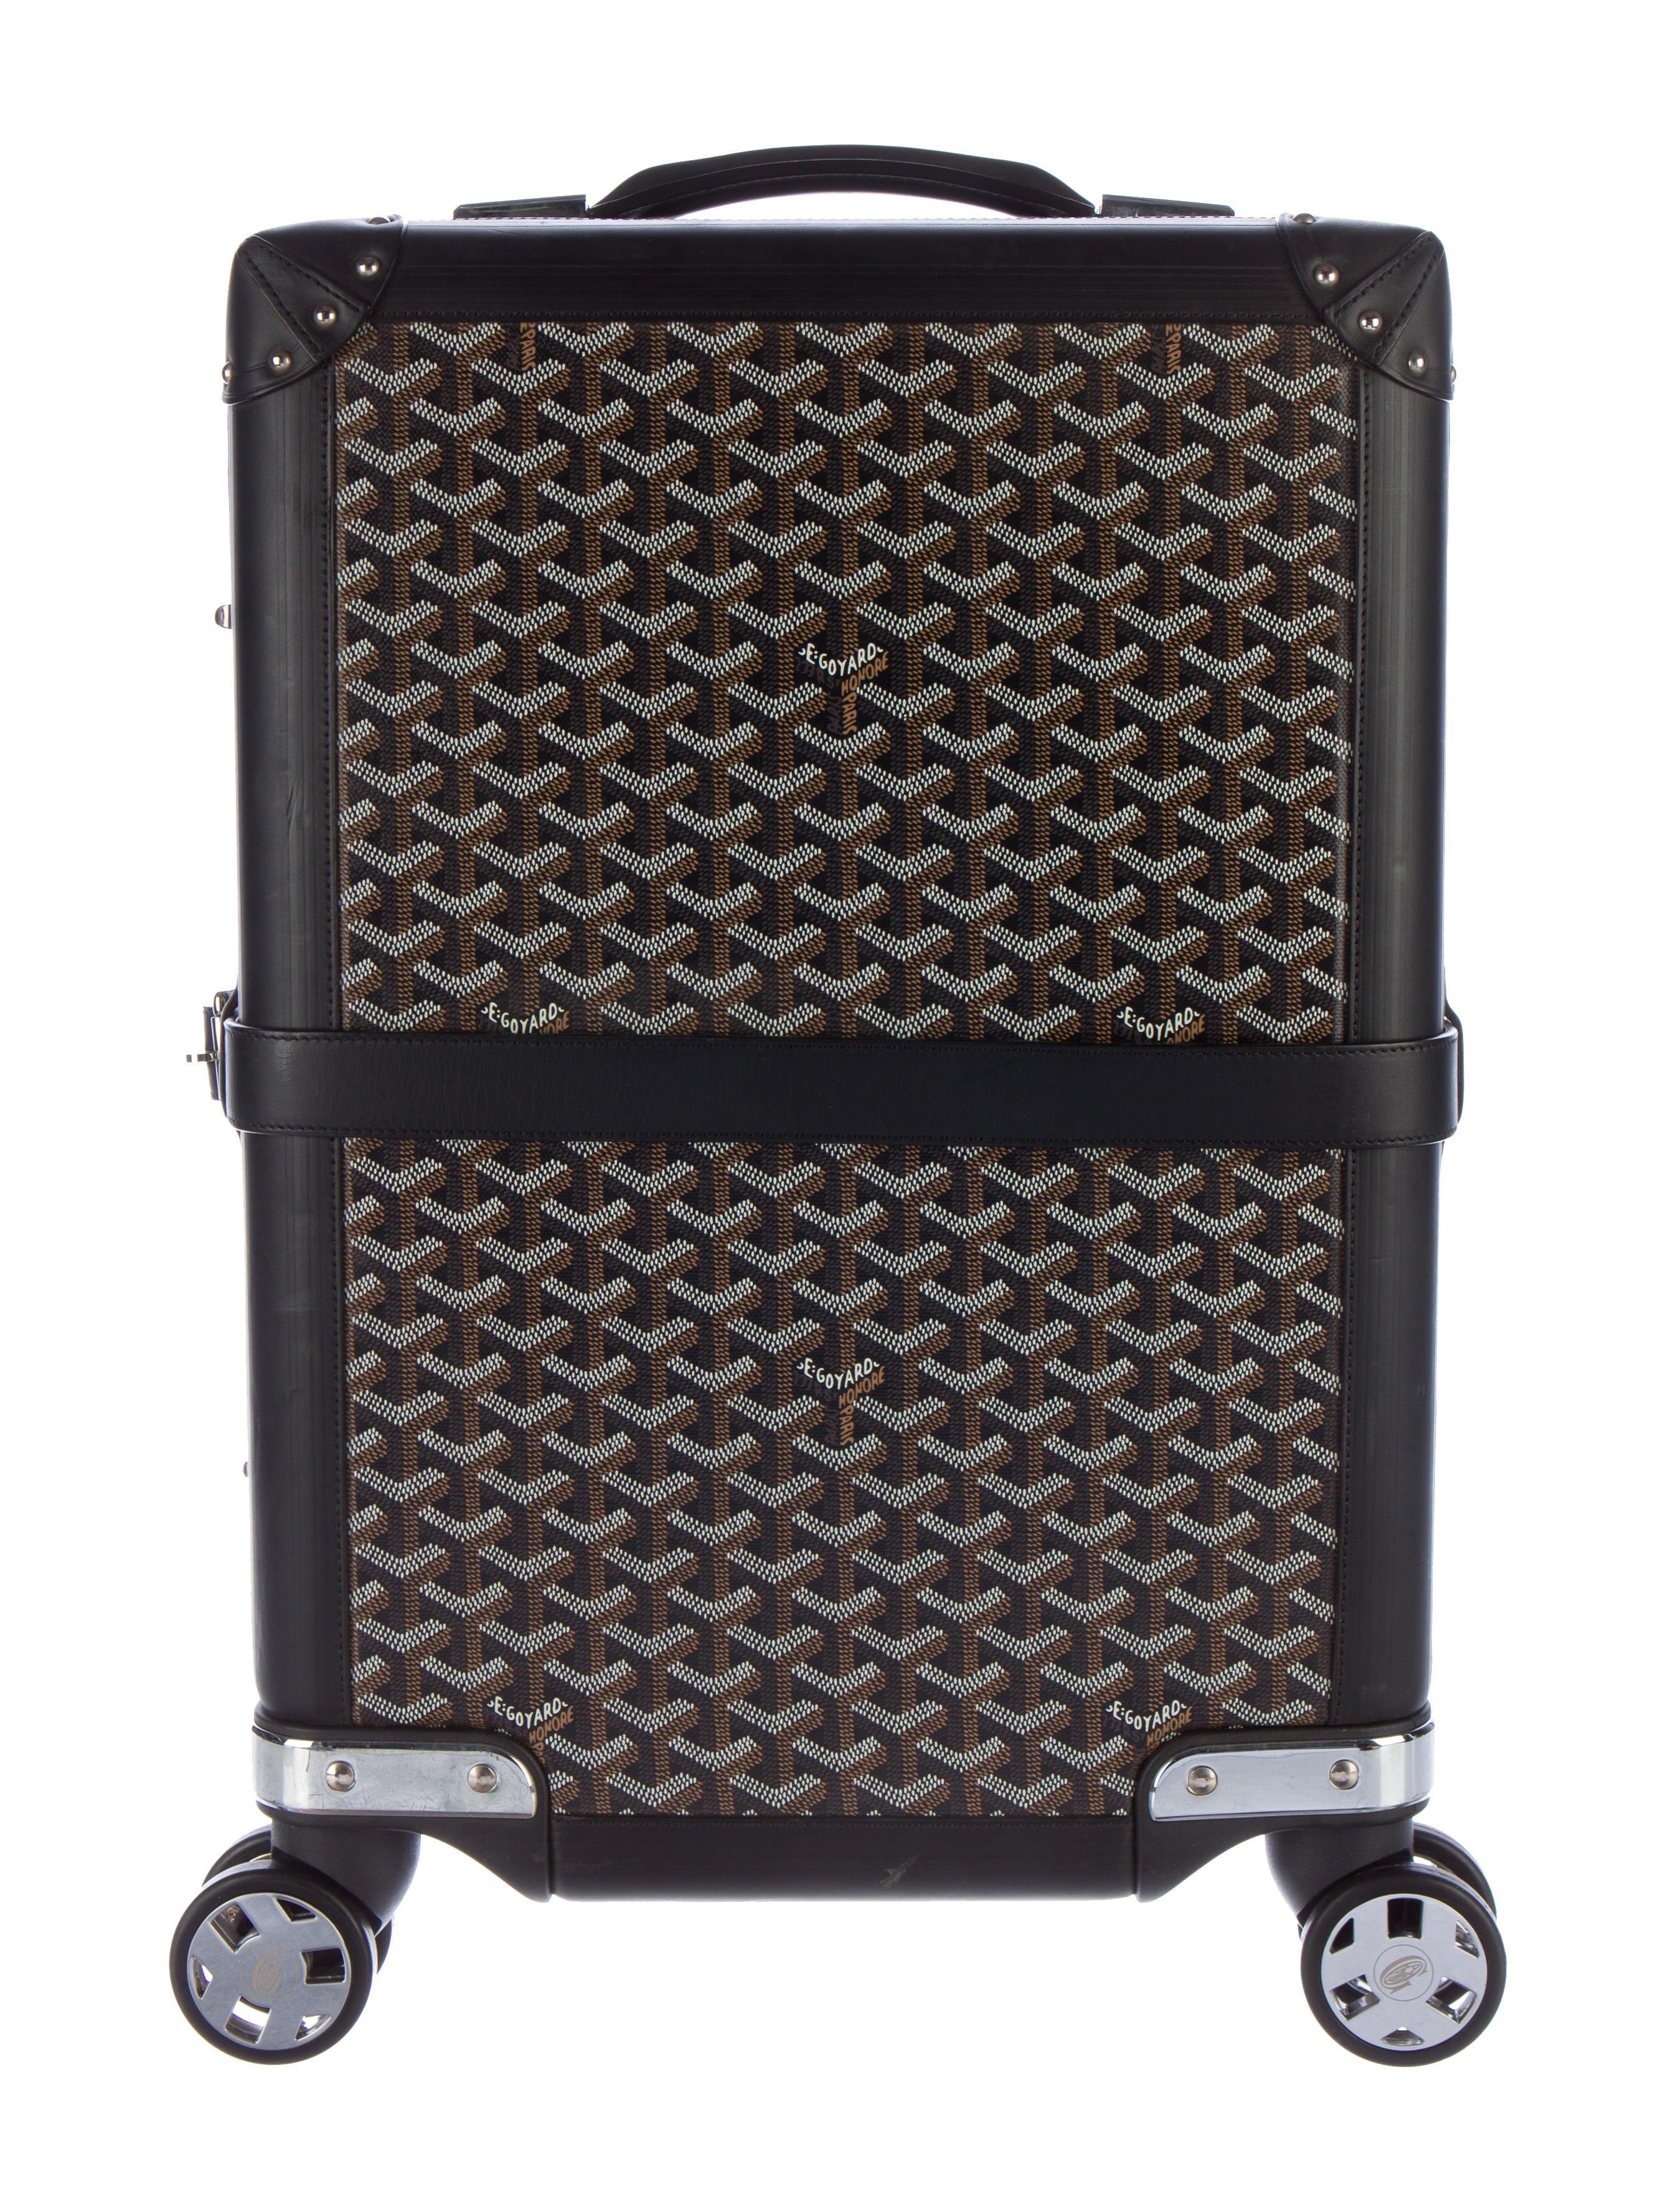 Goyard Bourget Pm Luggage Goy21250 The Realreal